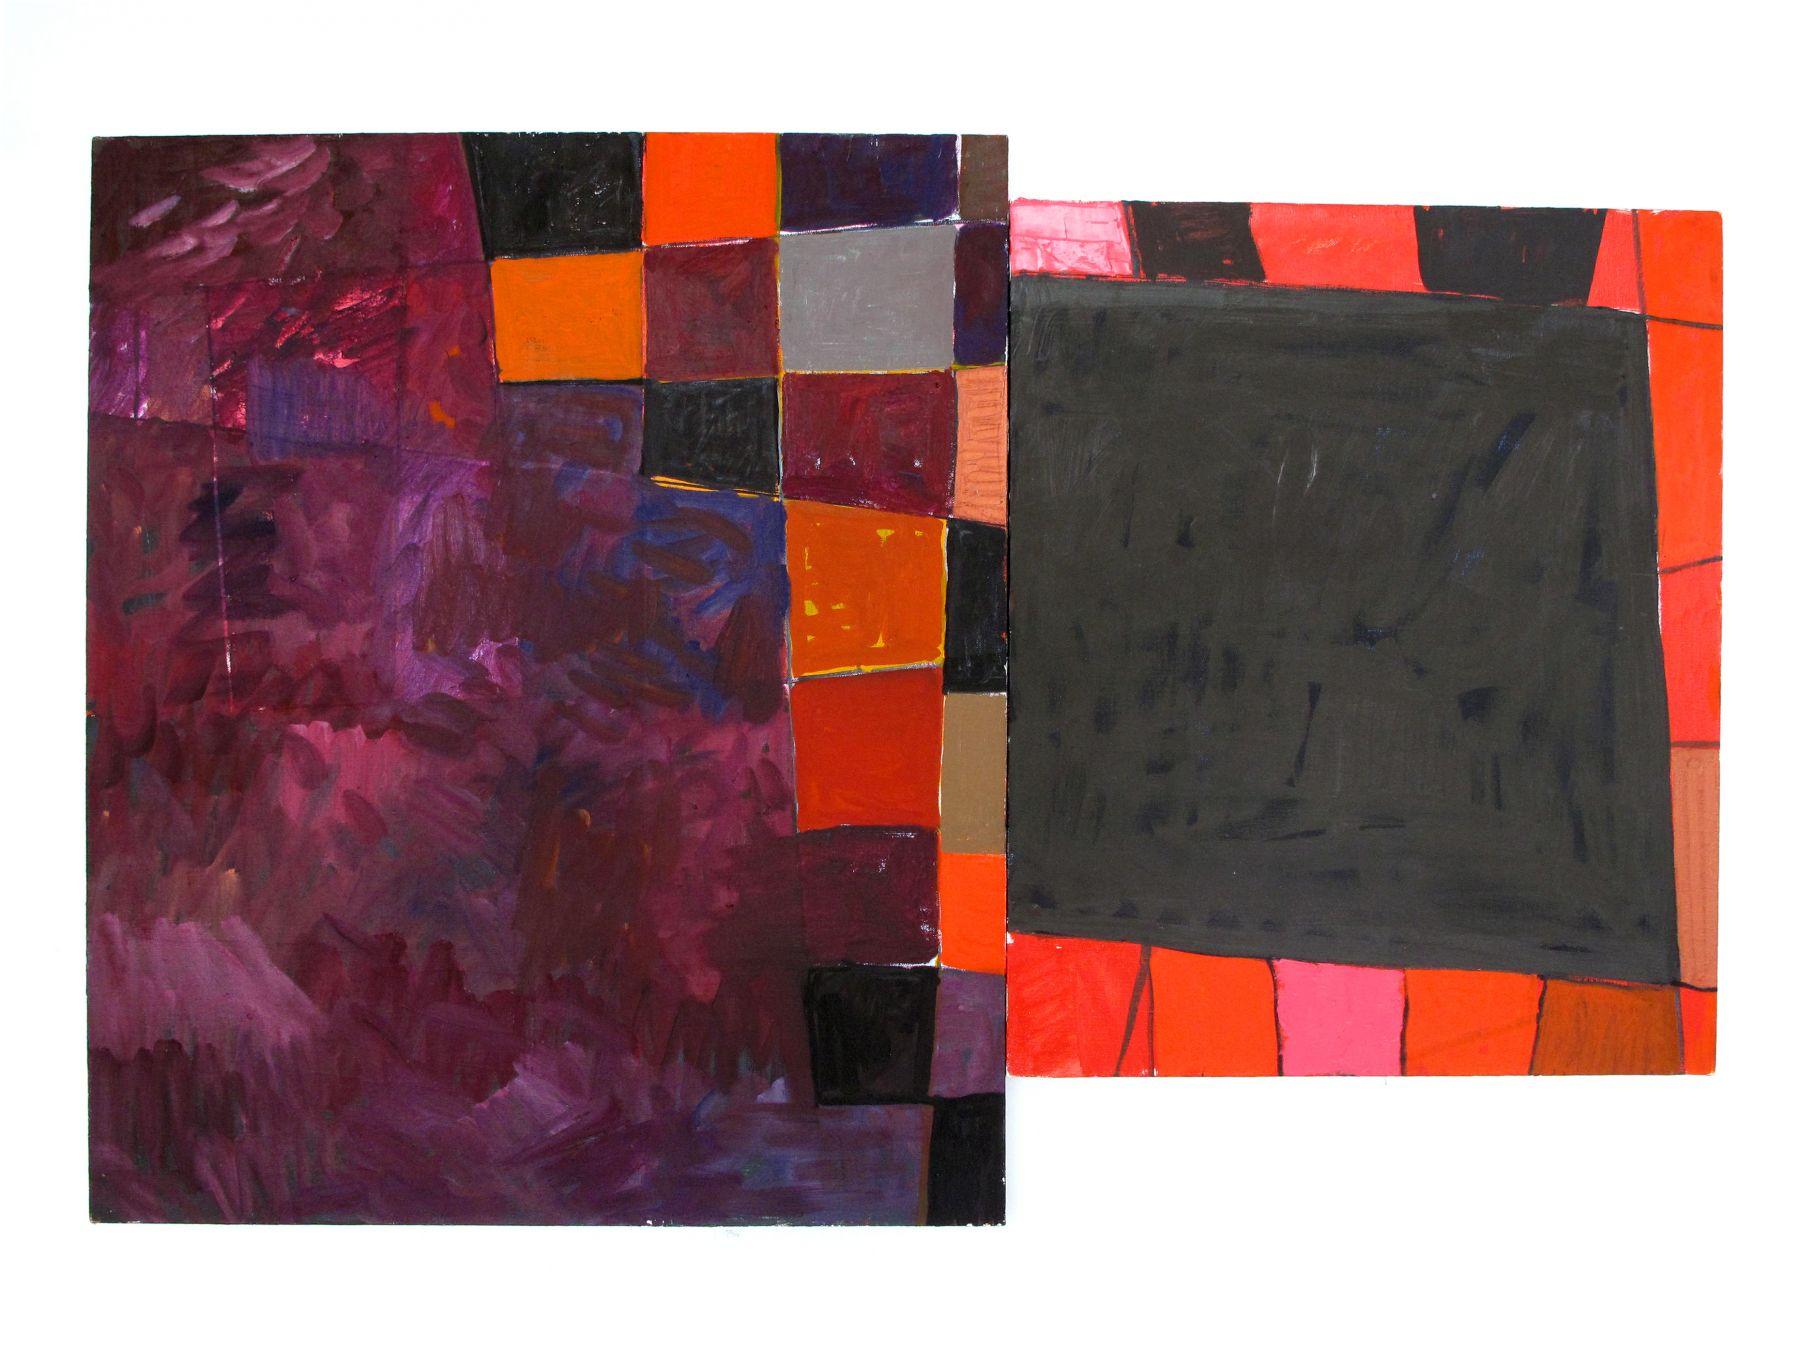 Richard Hawkins Venetian Painting: purple, grey, 2009 oil on linen Overall: 30 x 45 inches (76.2 x 114.3 cm)